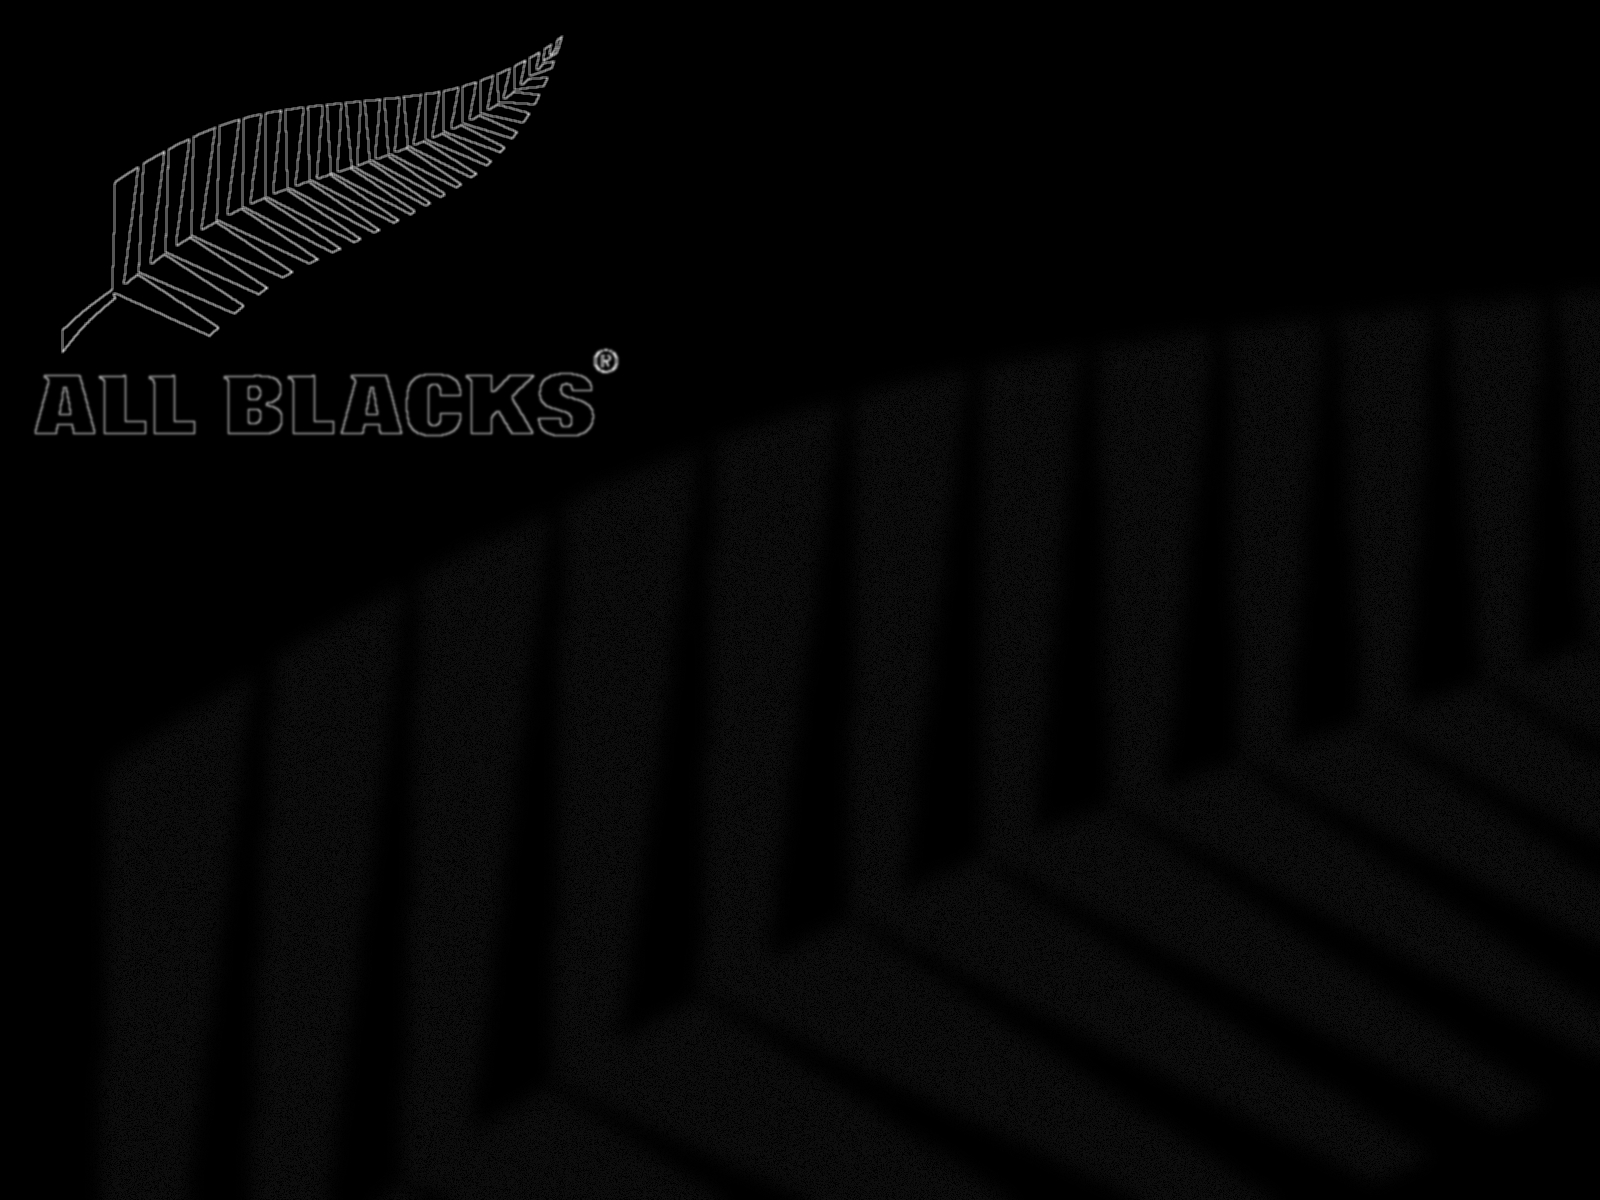 black wallpaper free hd all blacks wallpaper